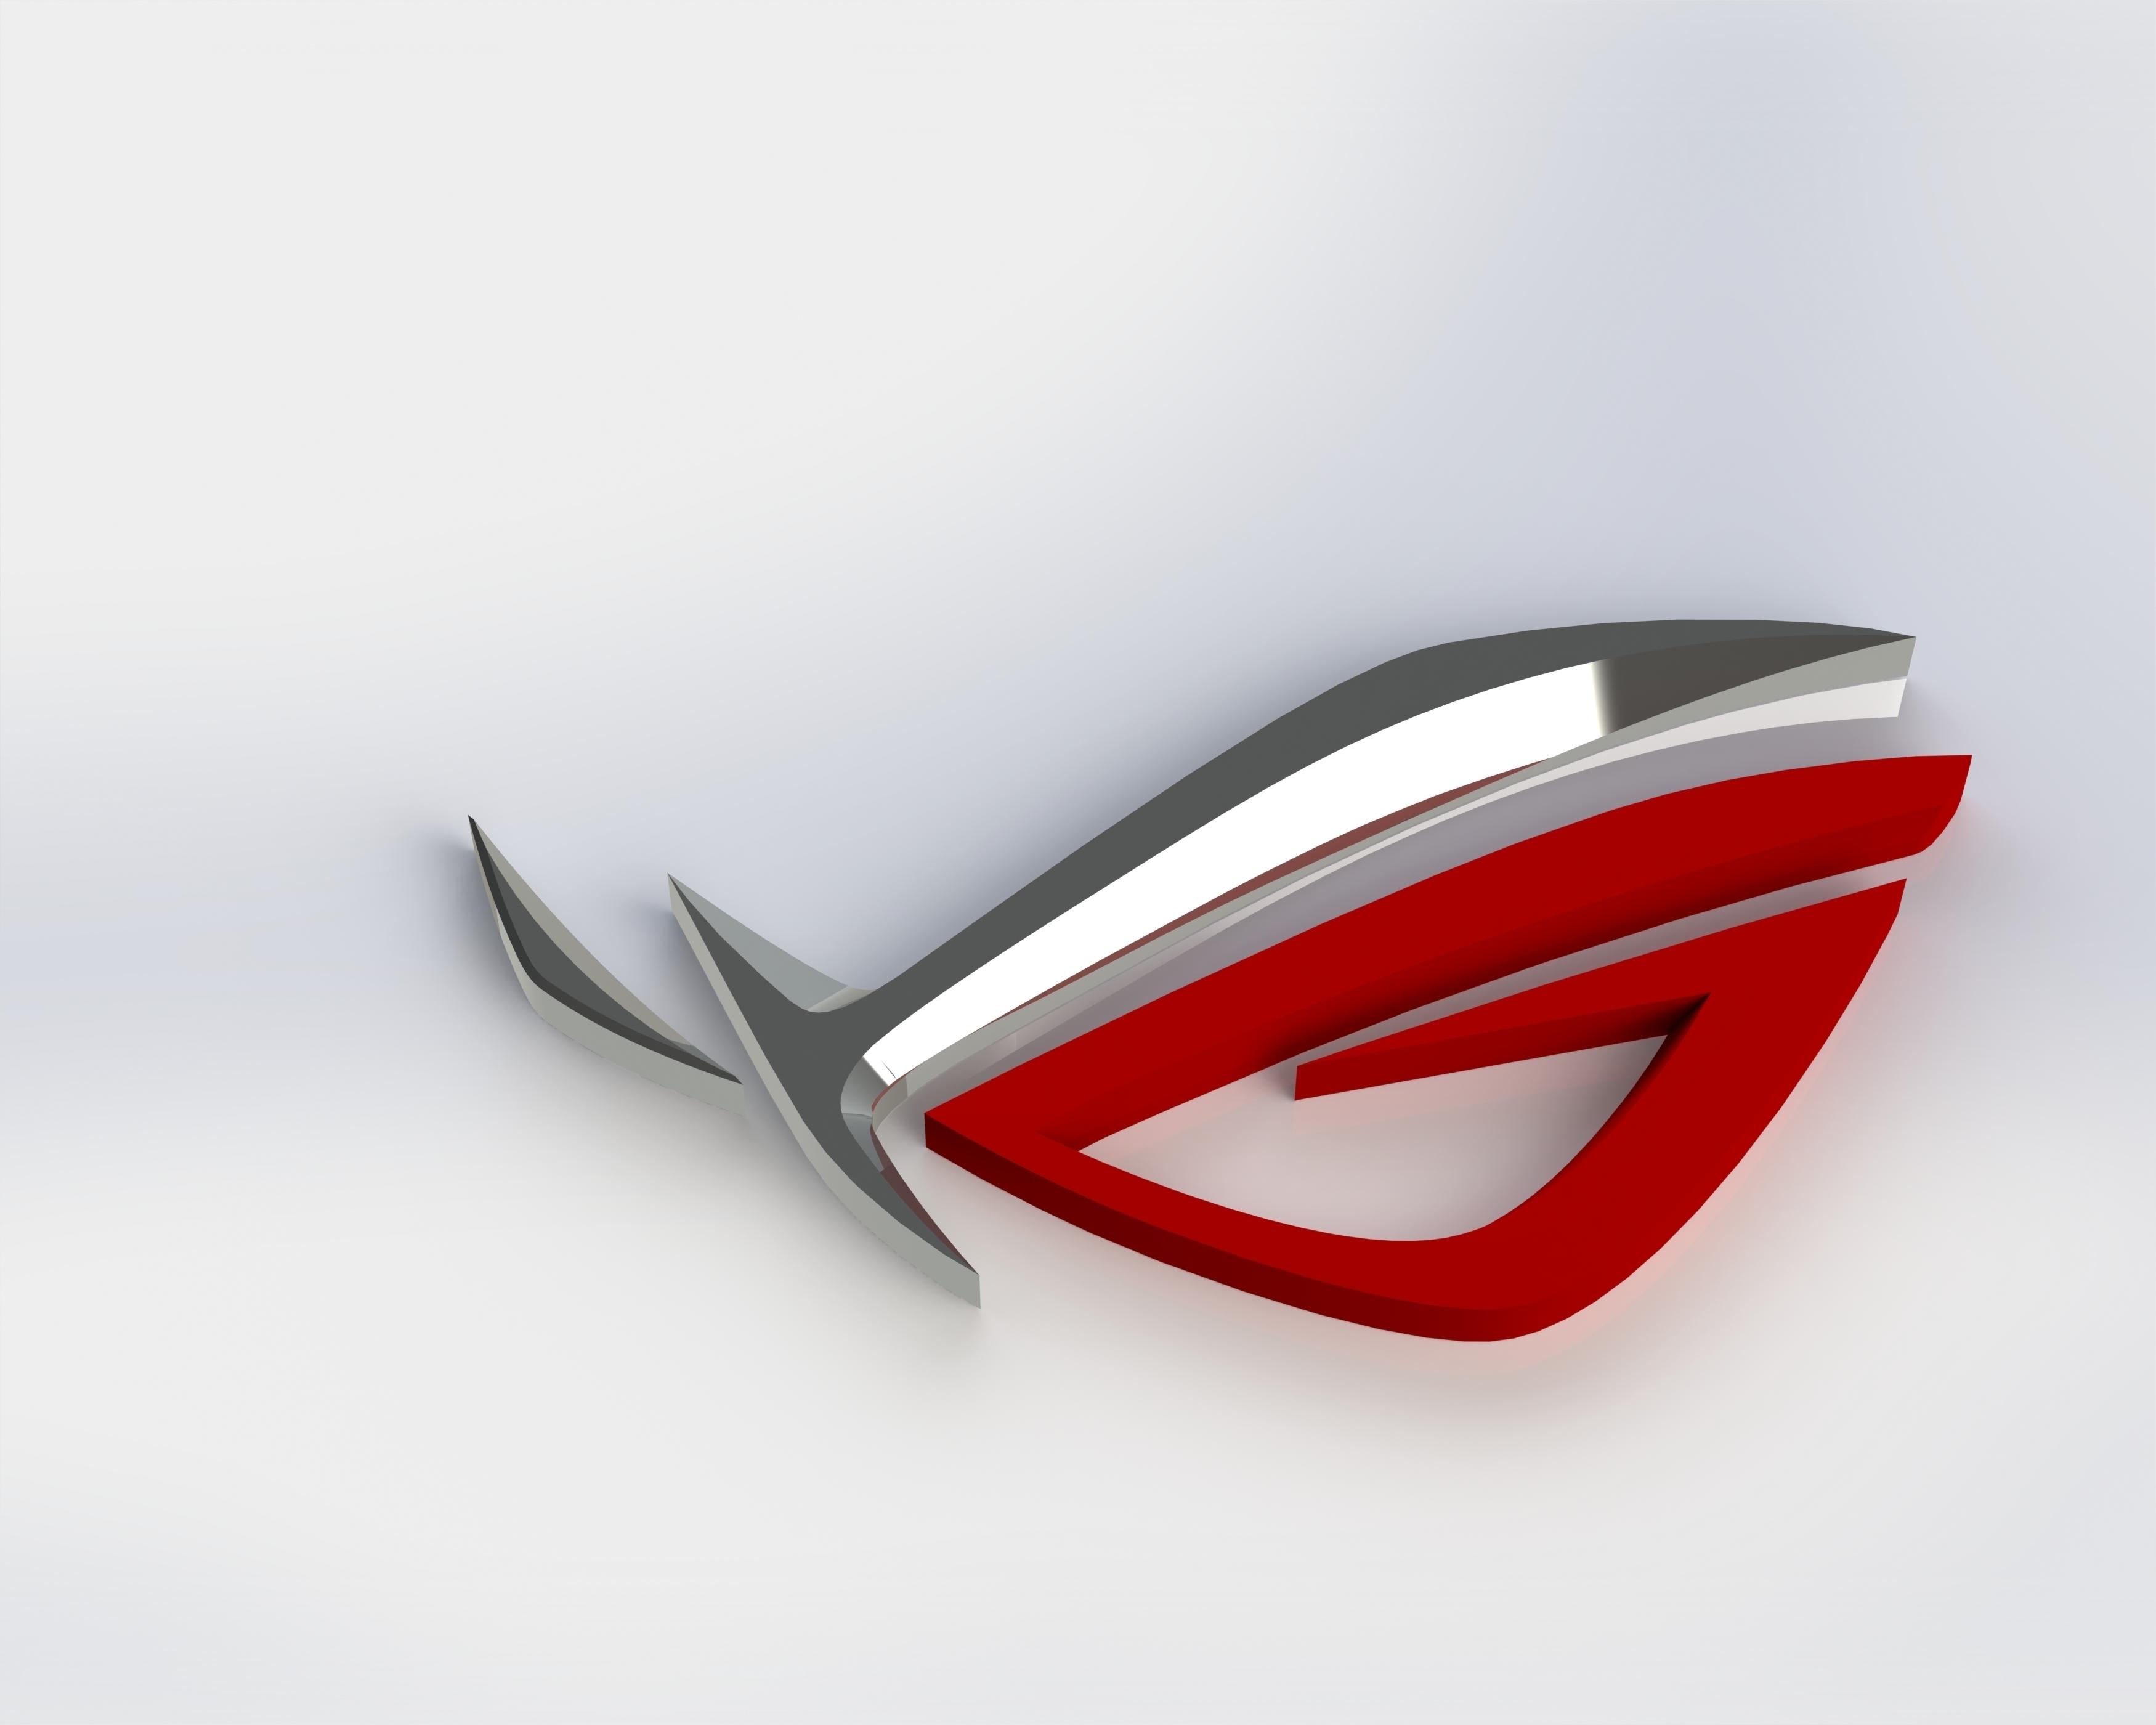 ROG Republic of Gamers logo @ Pinshape.